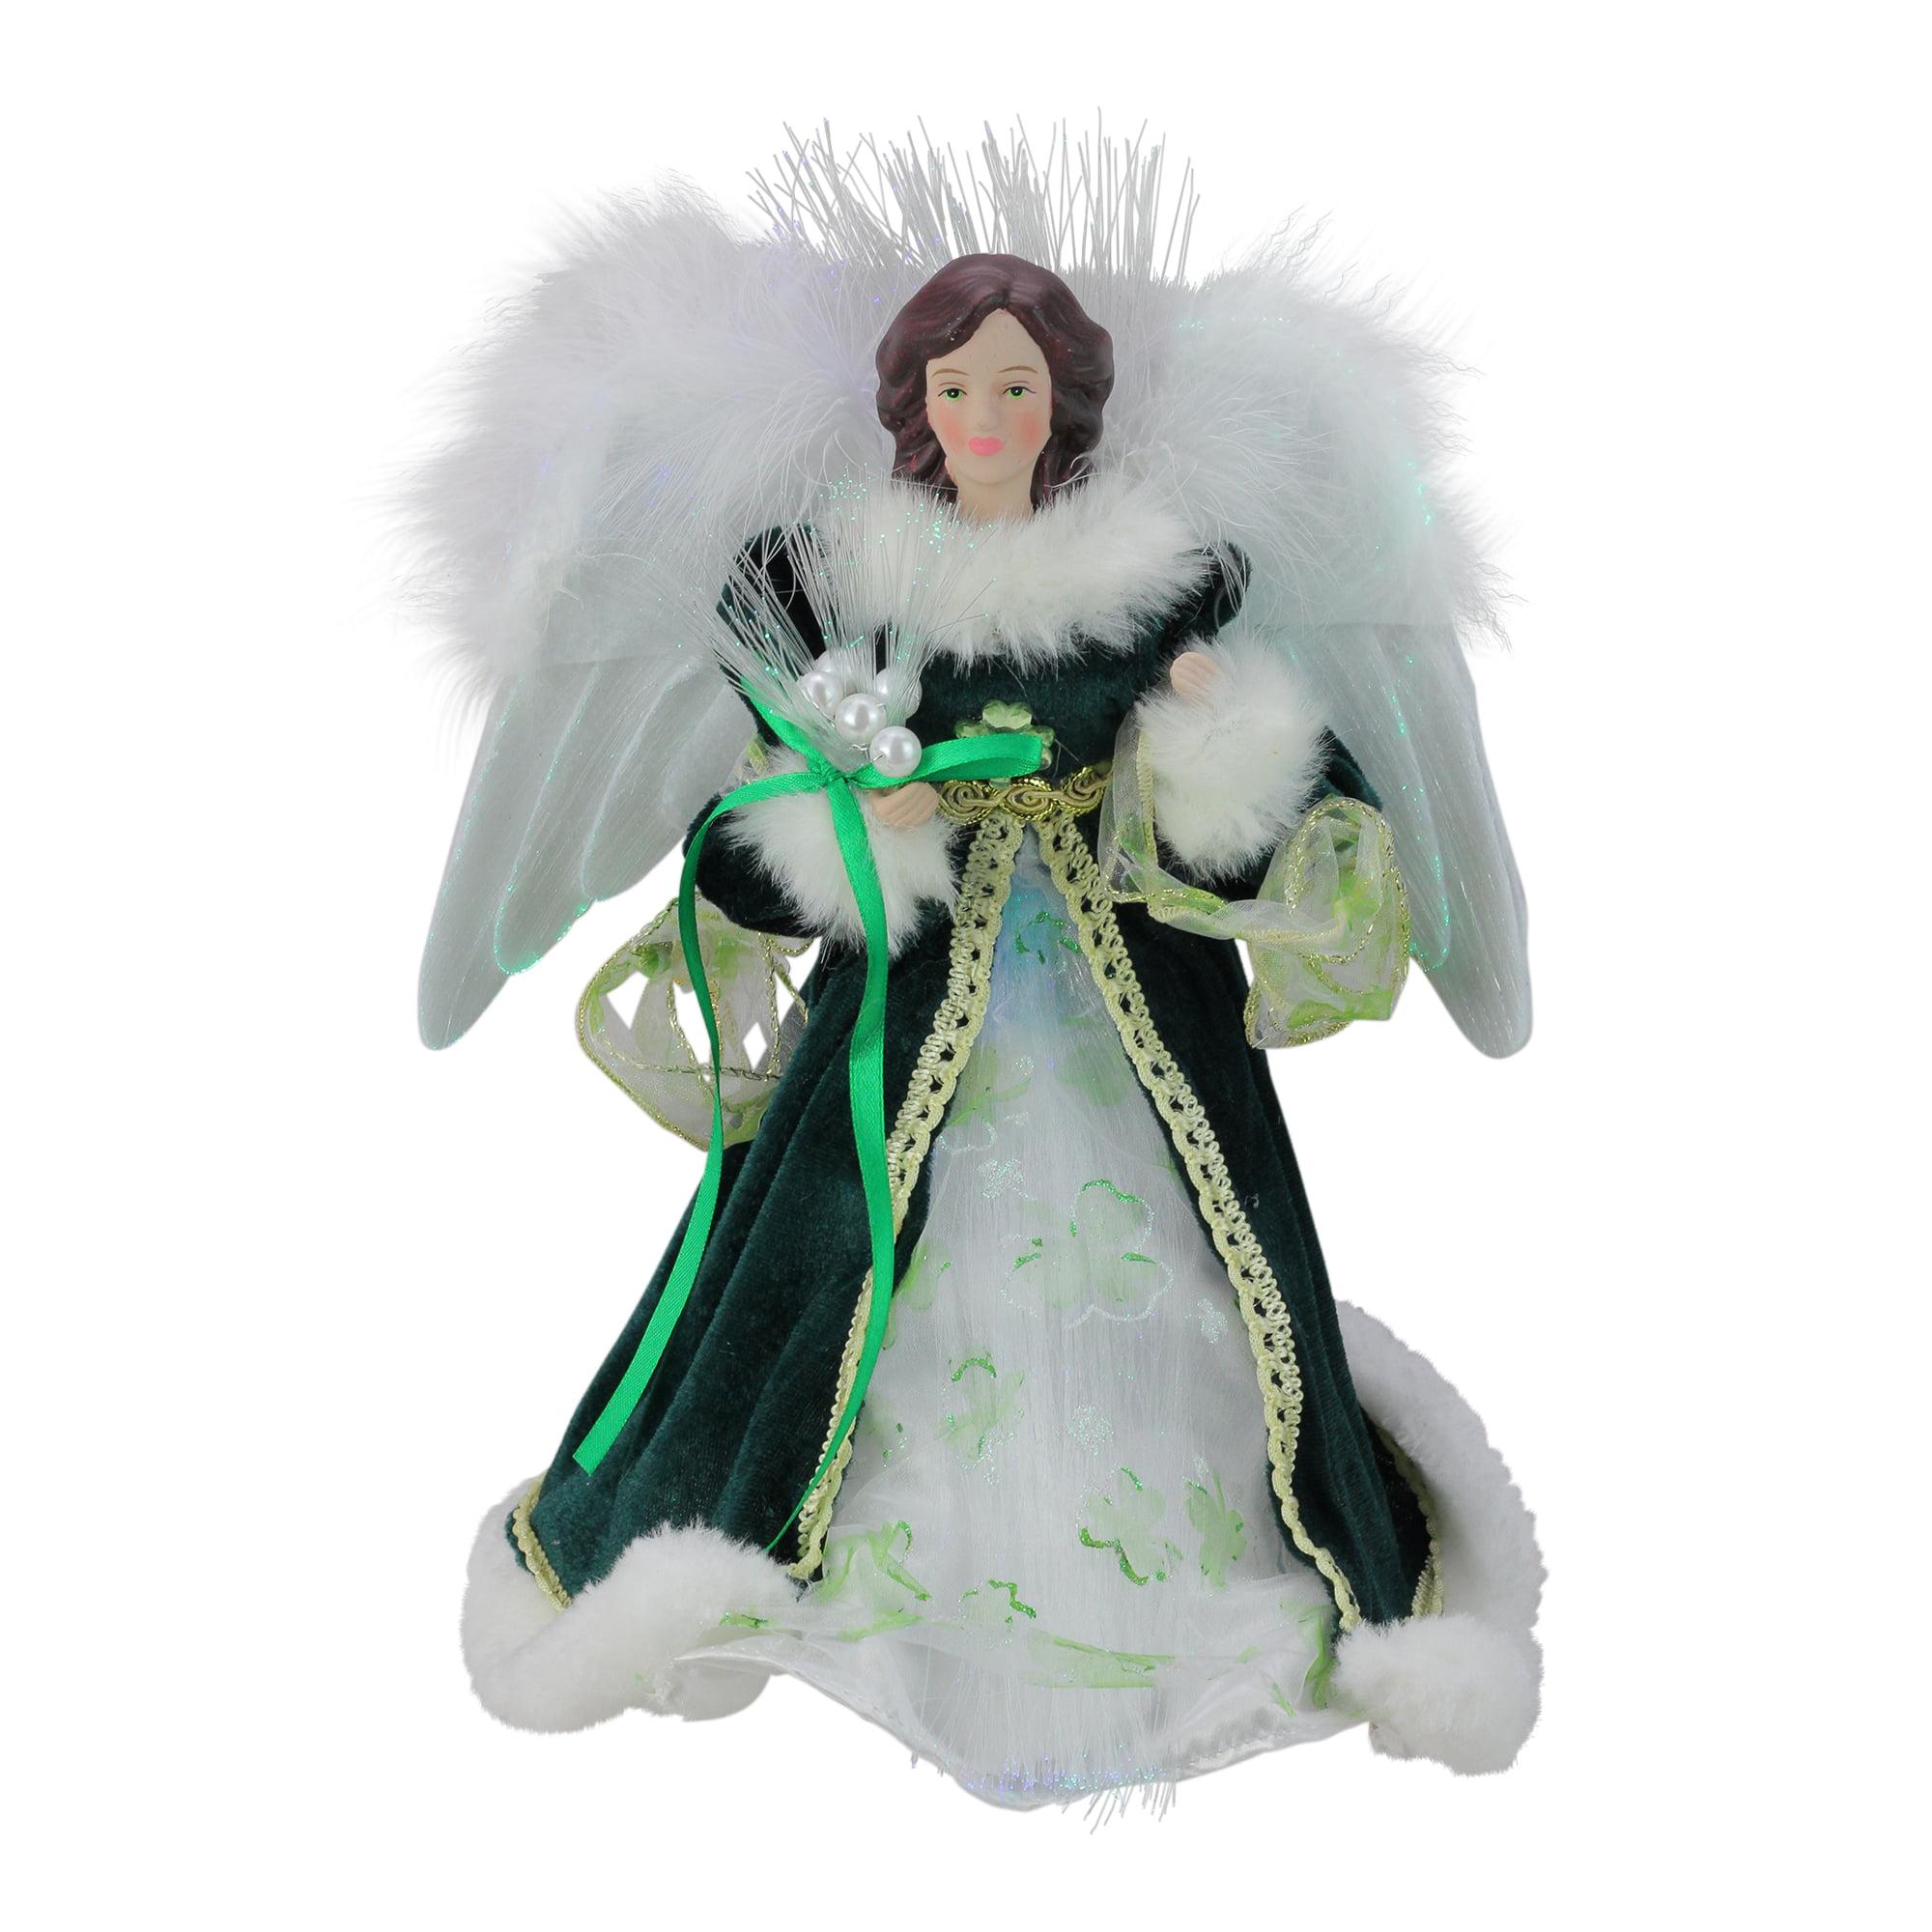 "12"" Luck of the Irish Fiber Optic Angel in Shamrock Dress Christmas Tree Topper"